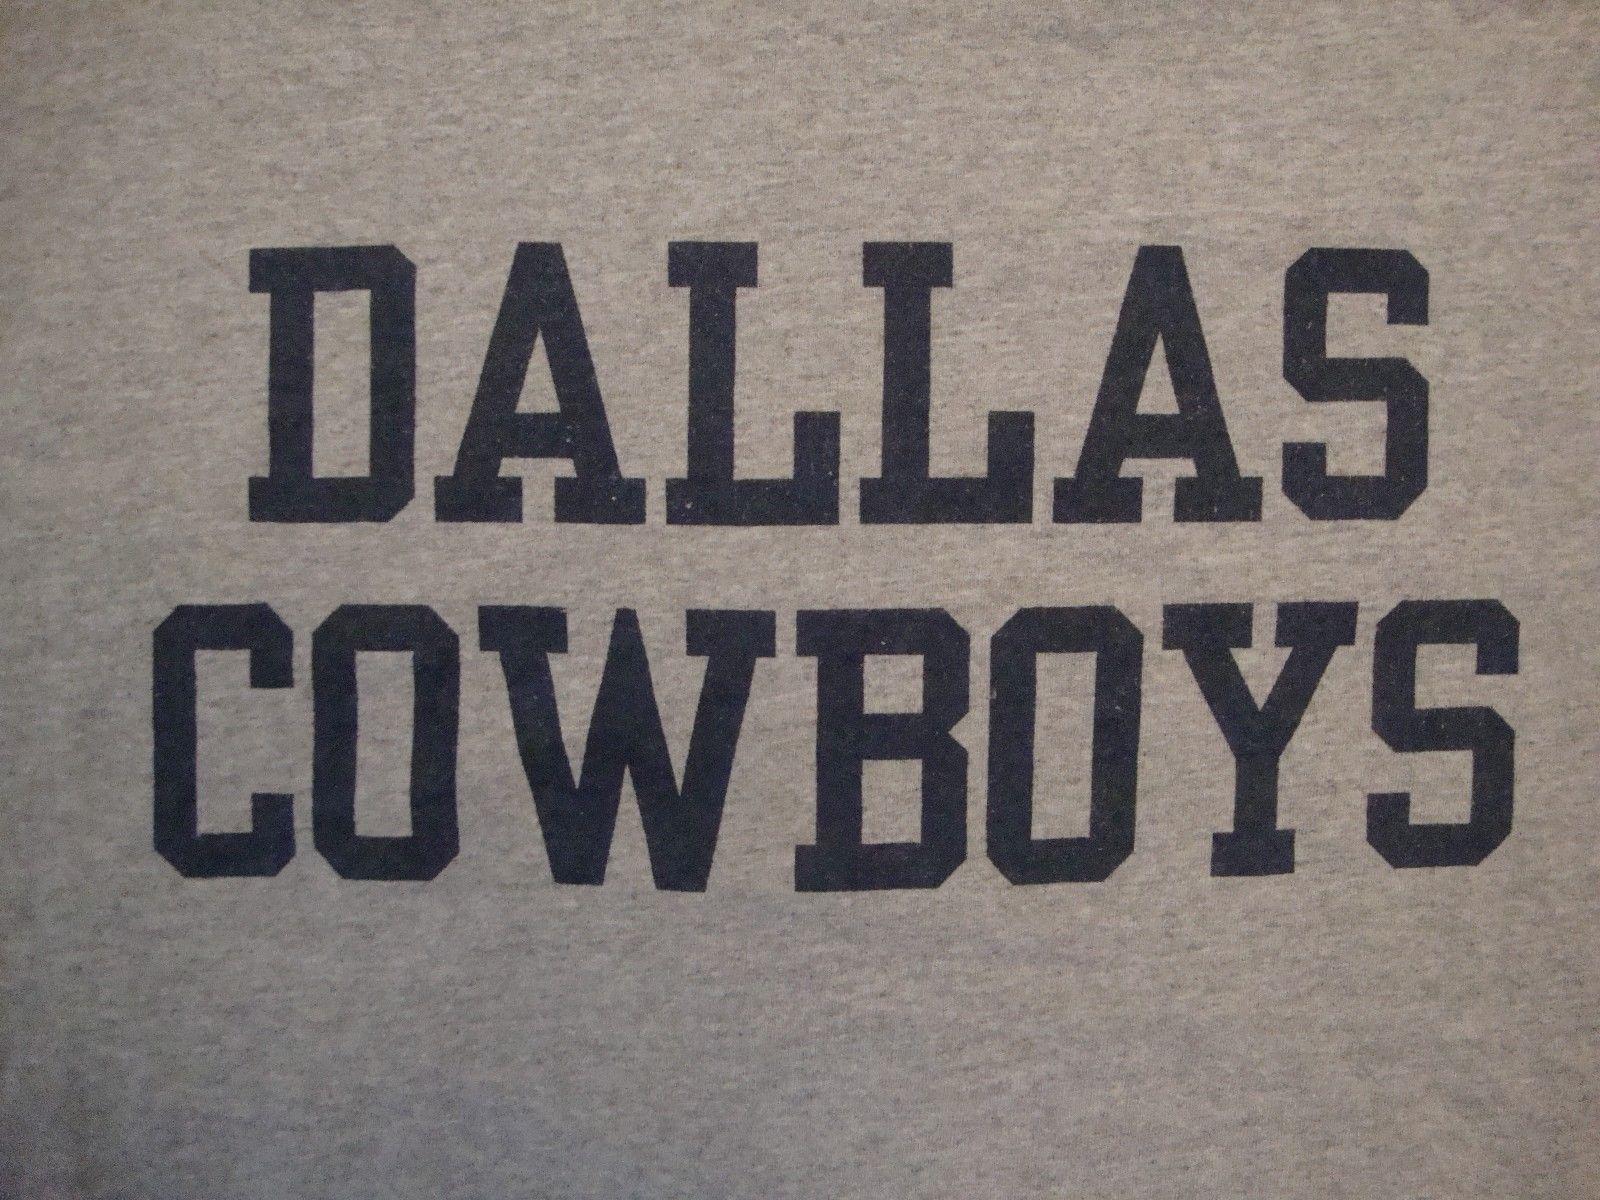 NFL Dallas Cowboys Football Sportswear Fan Apparel Gray Cotton T Shirt Size M